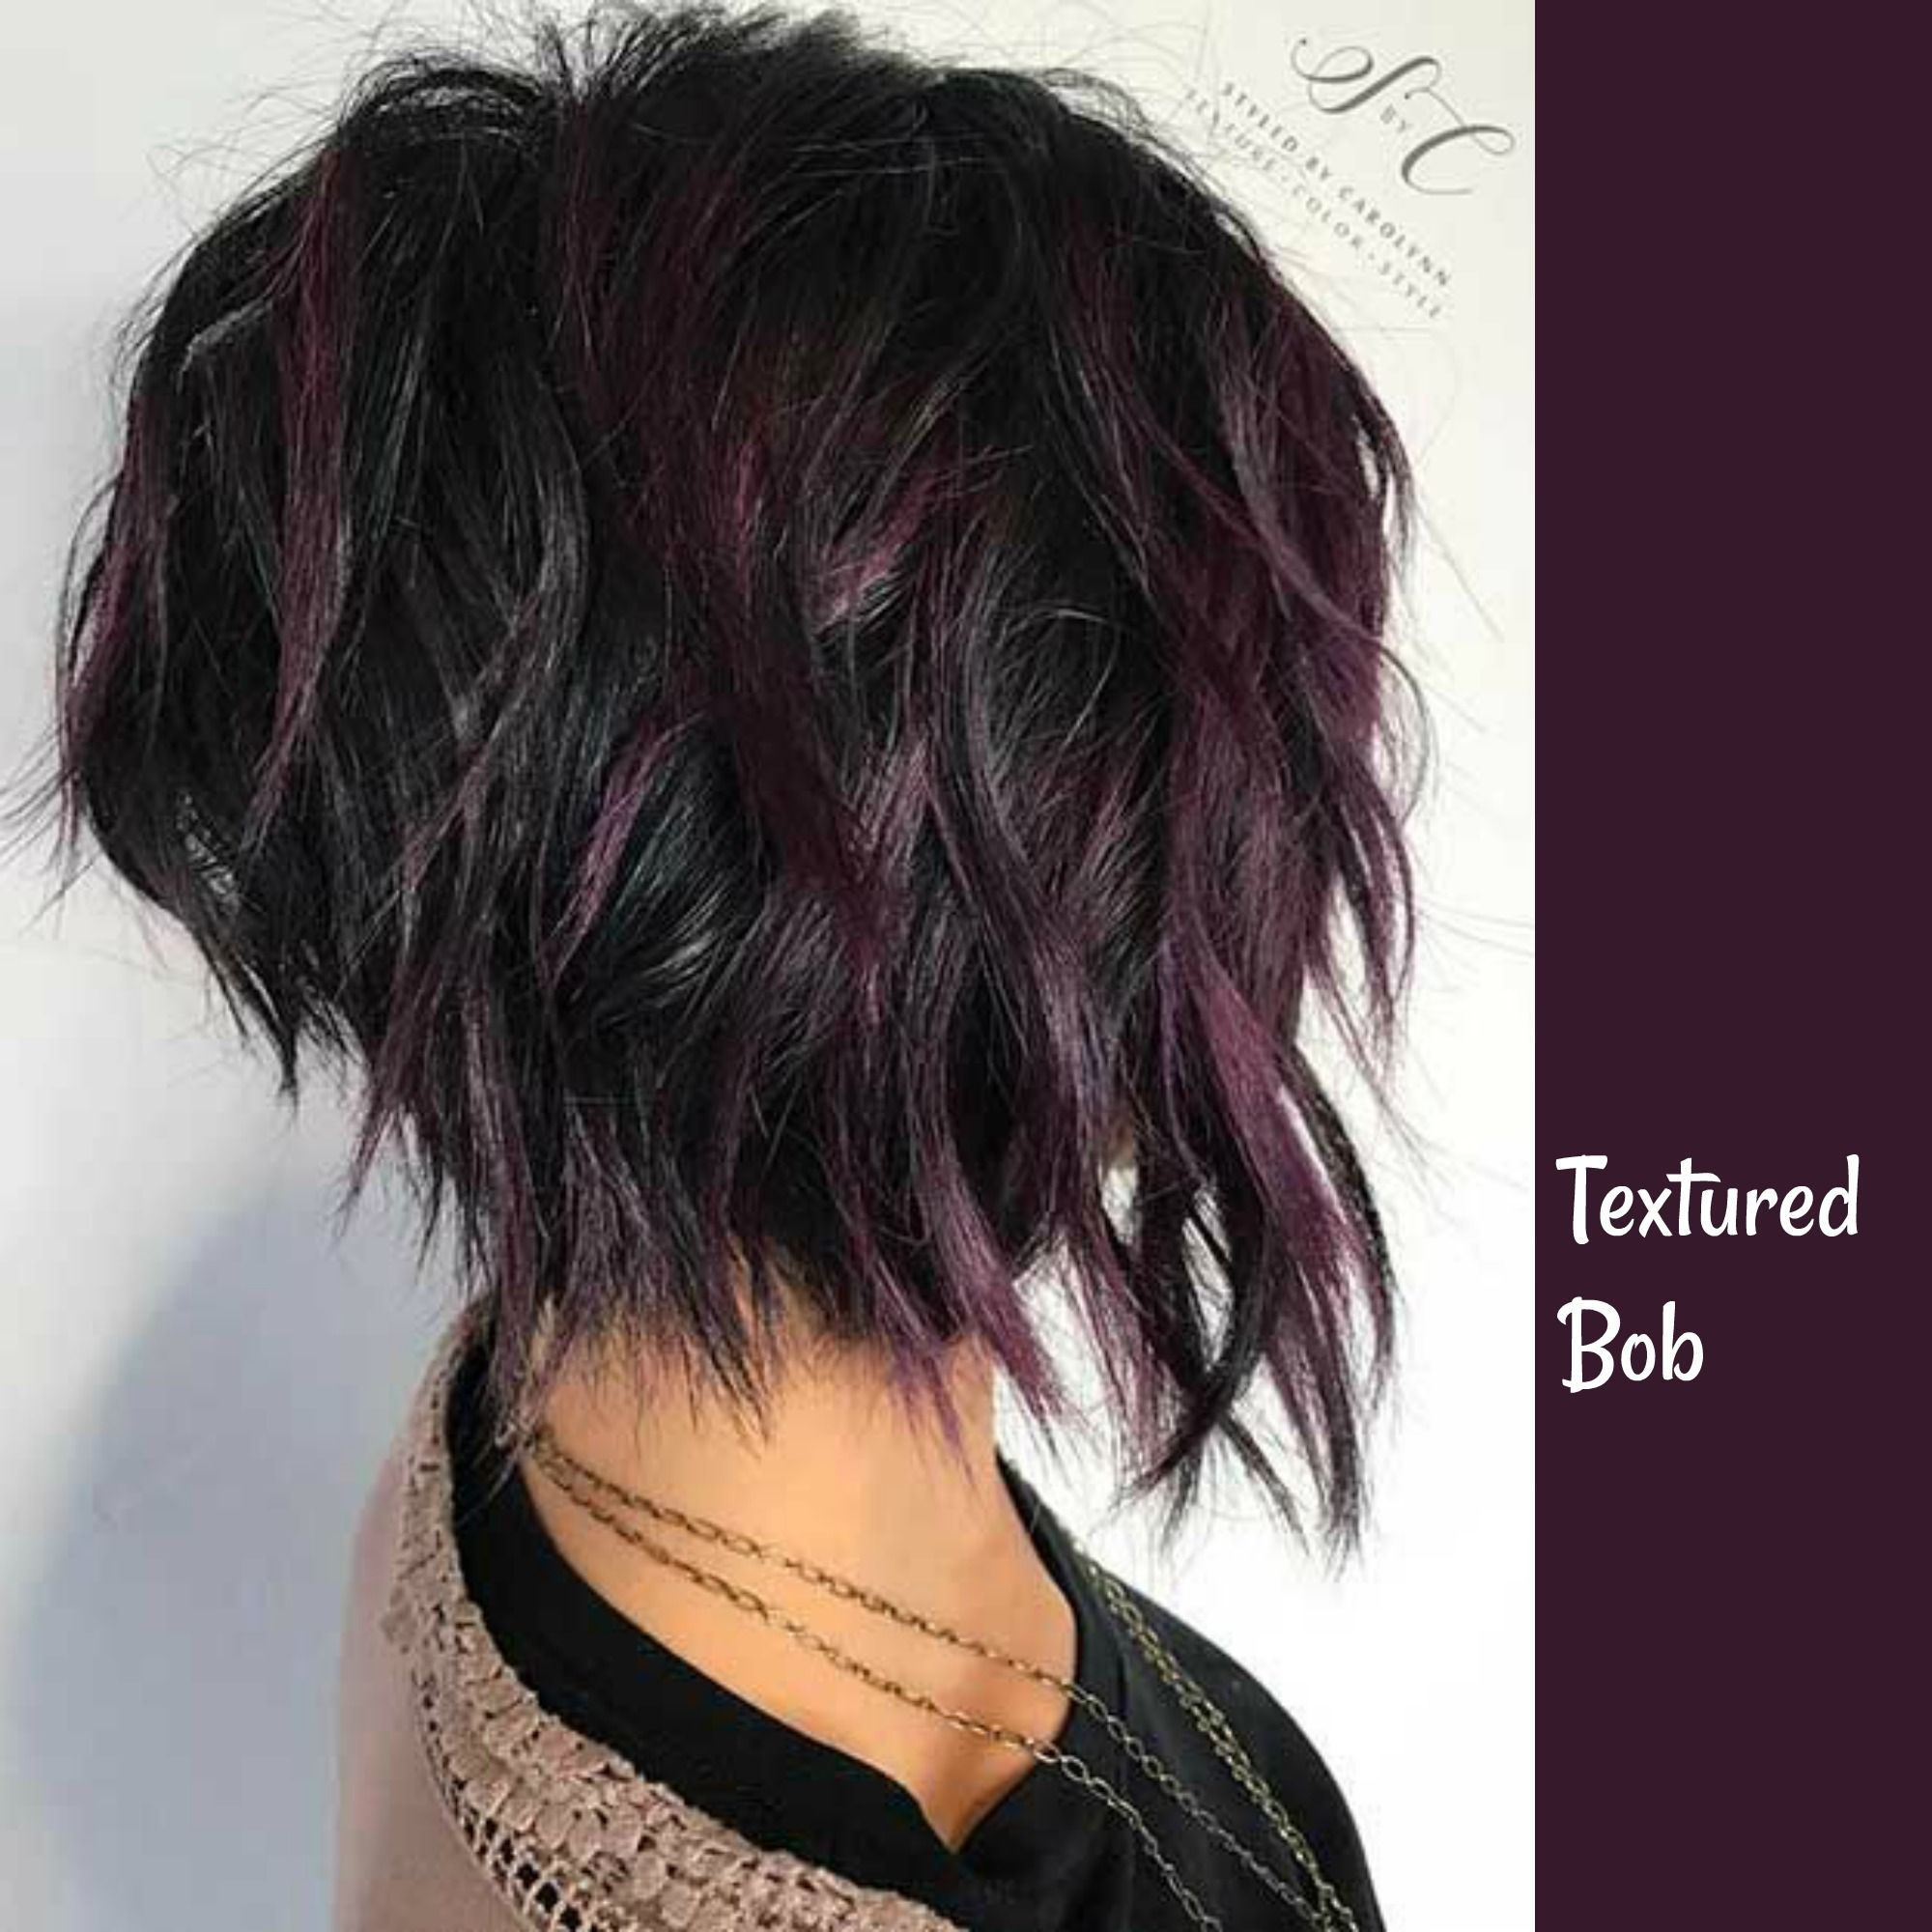 textured bob with purple highlights on dark hair haare. Black Bedroom Furniture Sets. Home Design Ideas